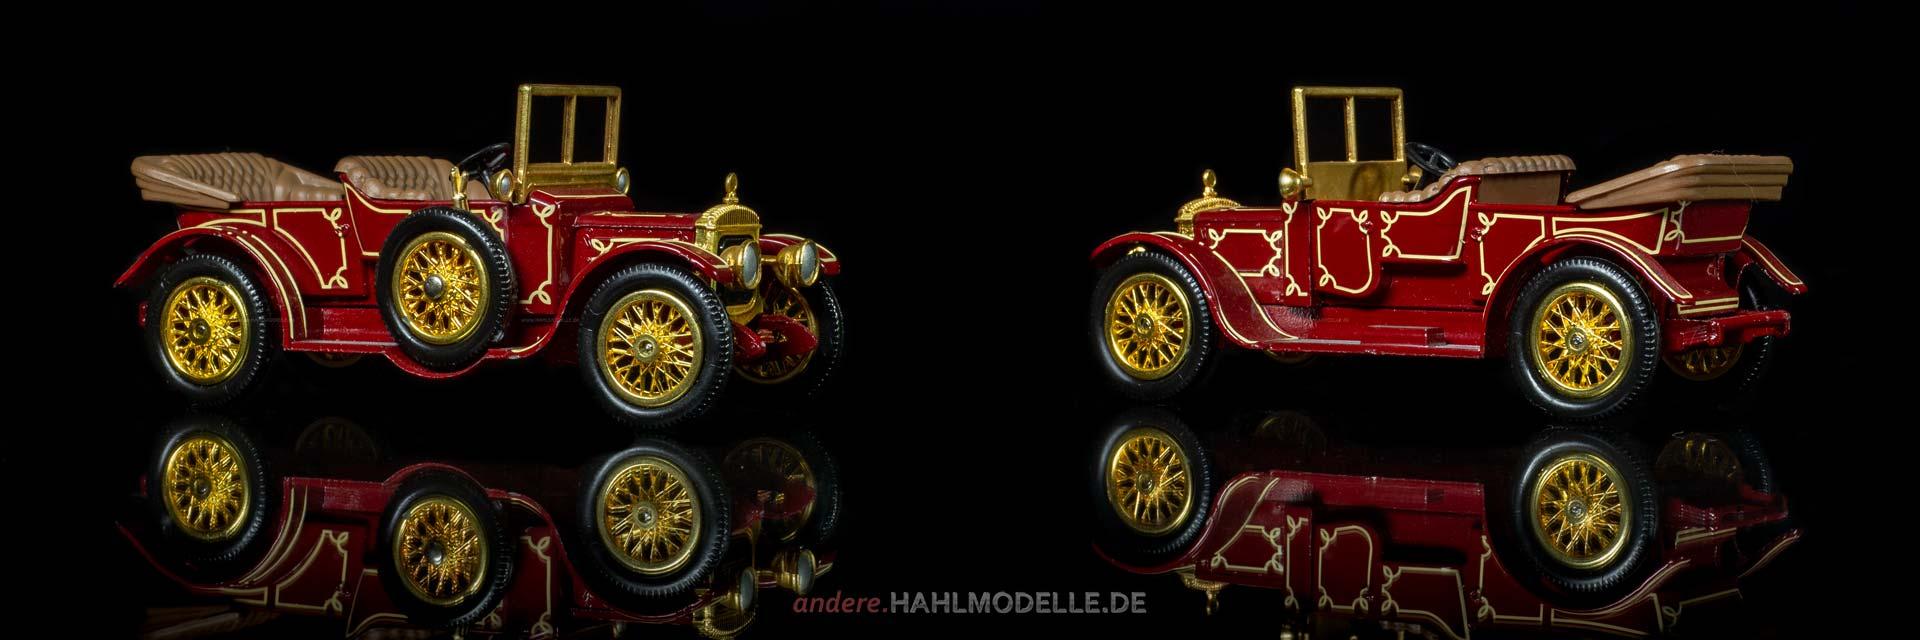 Daimler 12hp A12 Tourer | Tourenwagen | Matchbox | 1:43 | www.andere.hahlmodelle.de